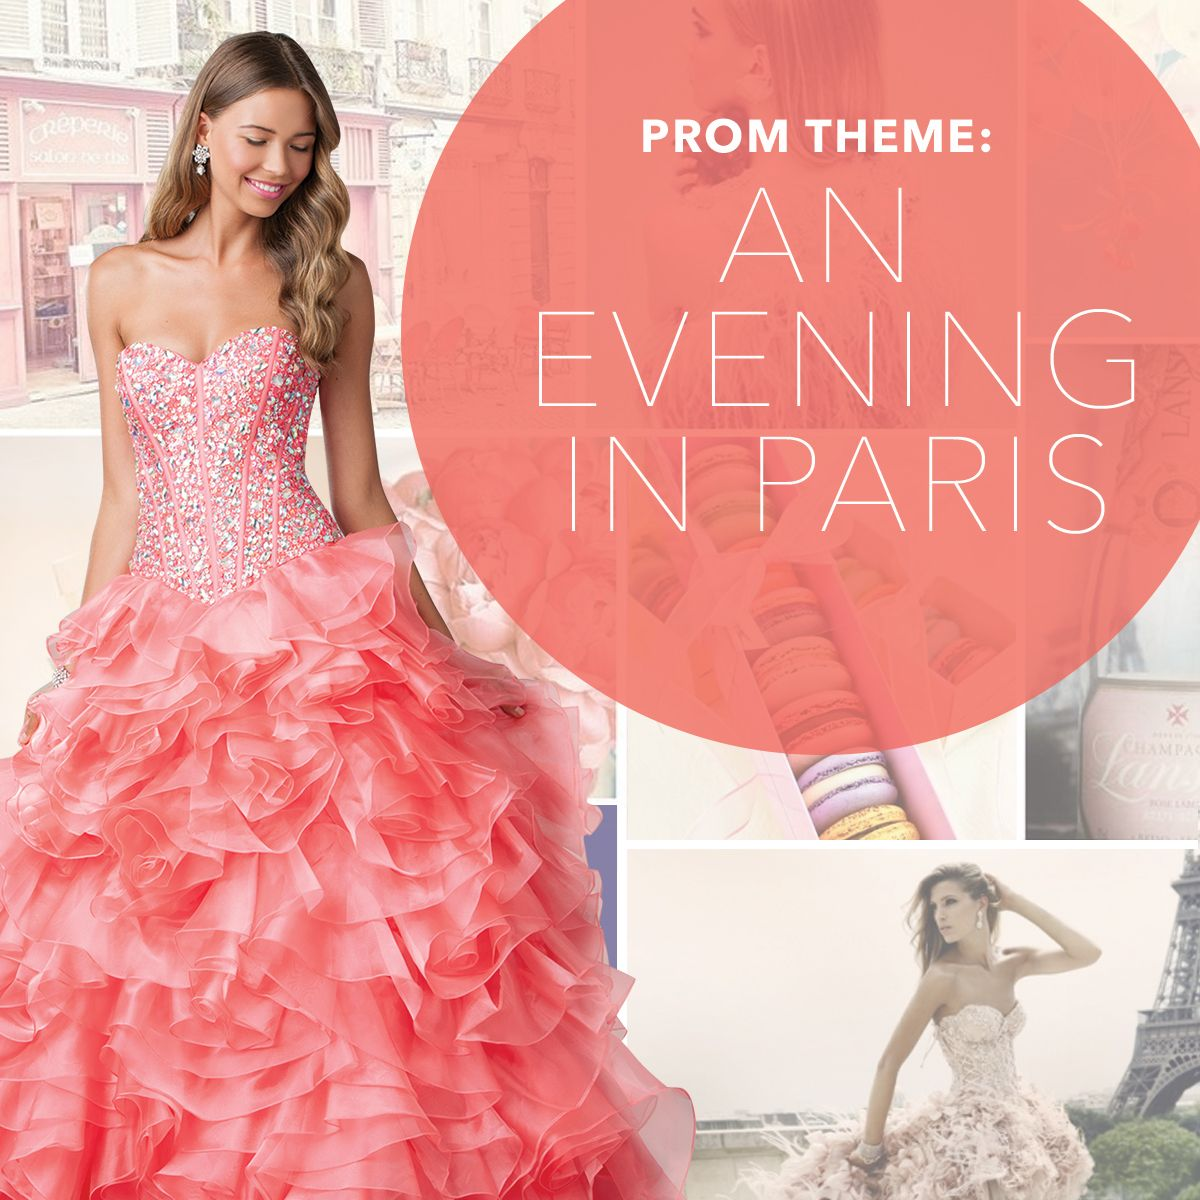 prom #dress #Paris | Prom Theme: One Night In Paris | Pinterest ...